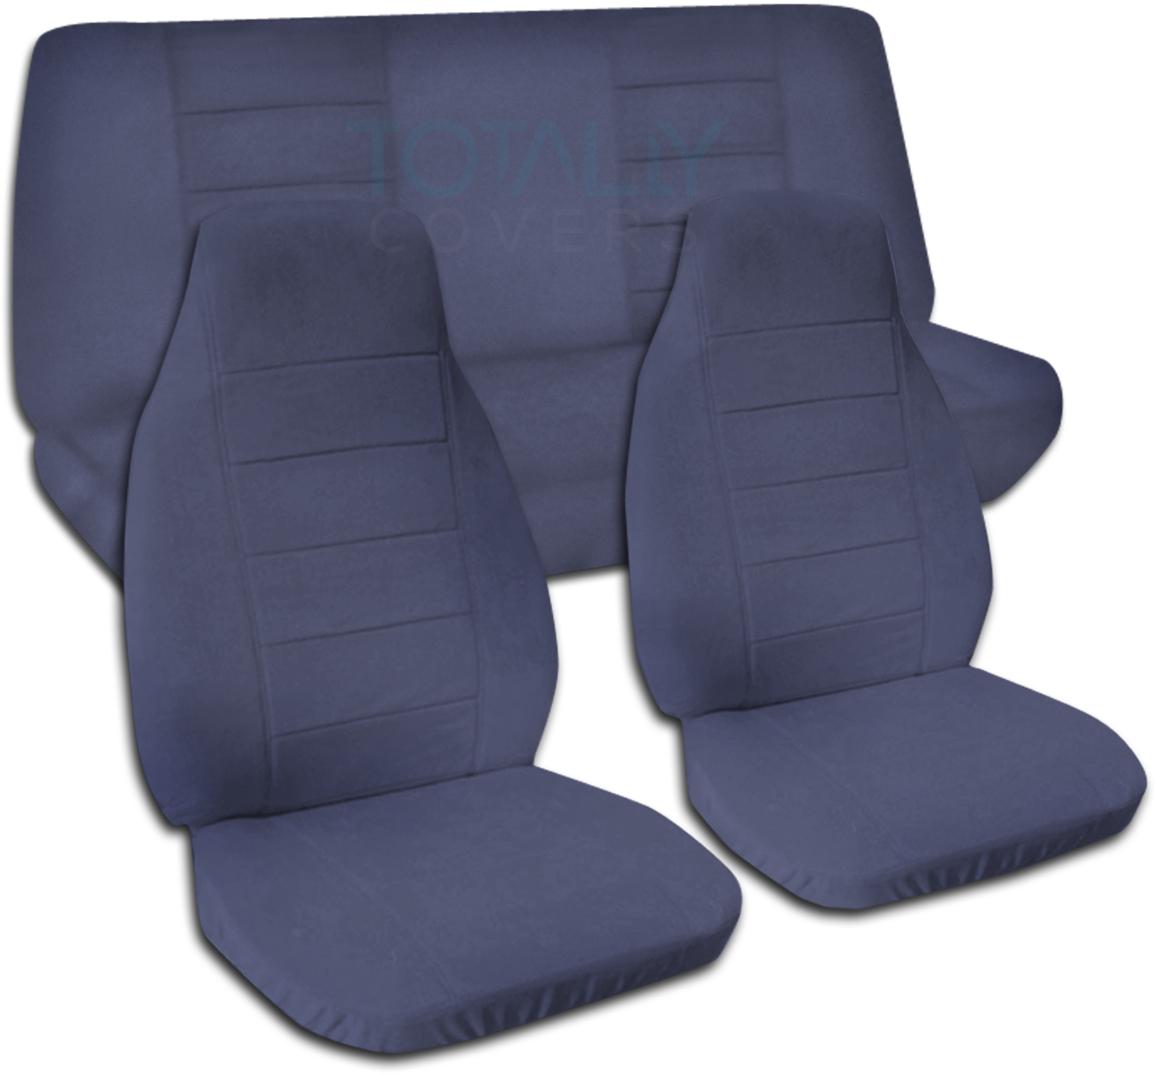 solid color car seat covers full set semi custom black gray brown blue pink ebay. Black Bedroom Furniture Sets. Home Design Ideas